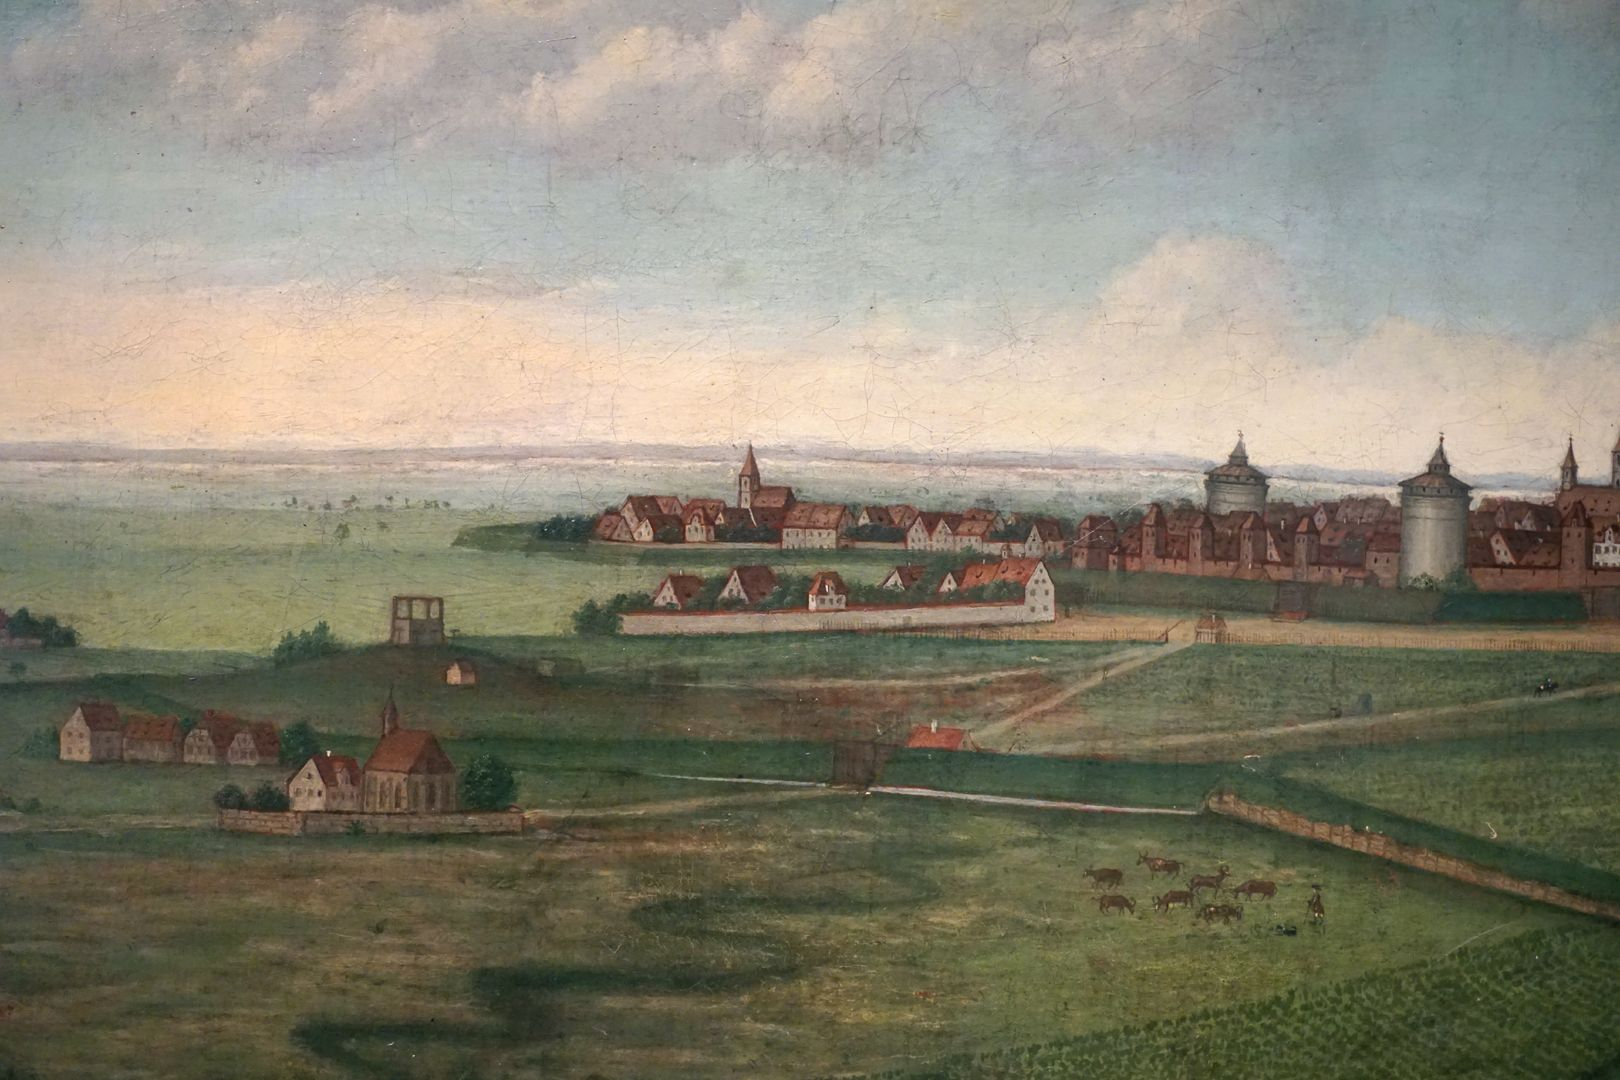 Nuremberg Galgenhof and Sankt Peter in the foreground